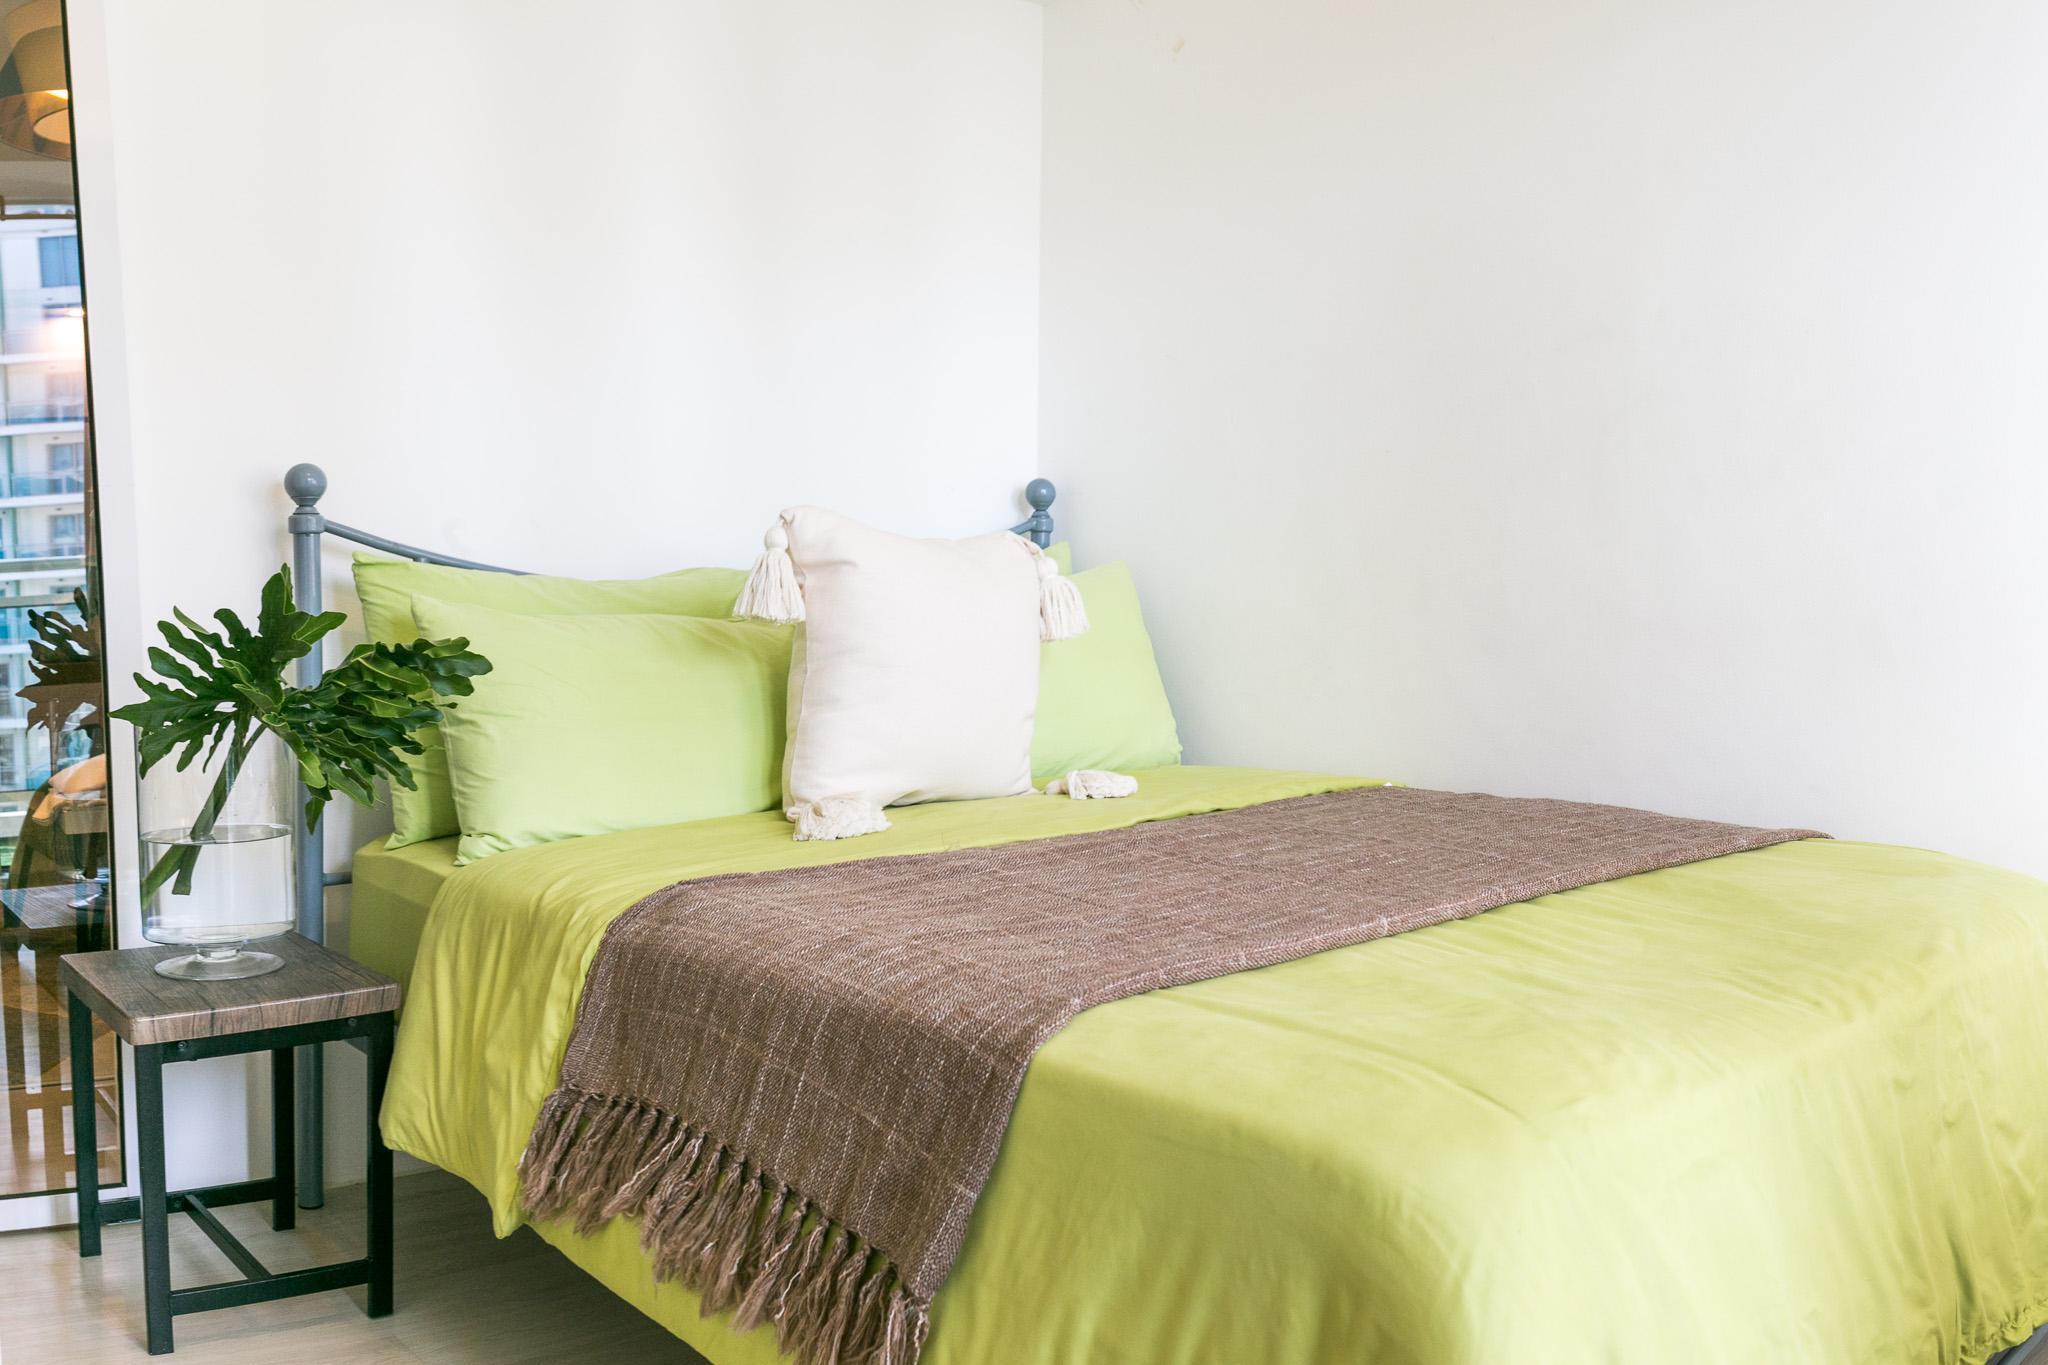 Adam'sCrib By Azure Urban Resort Residences